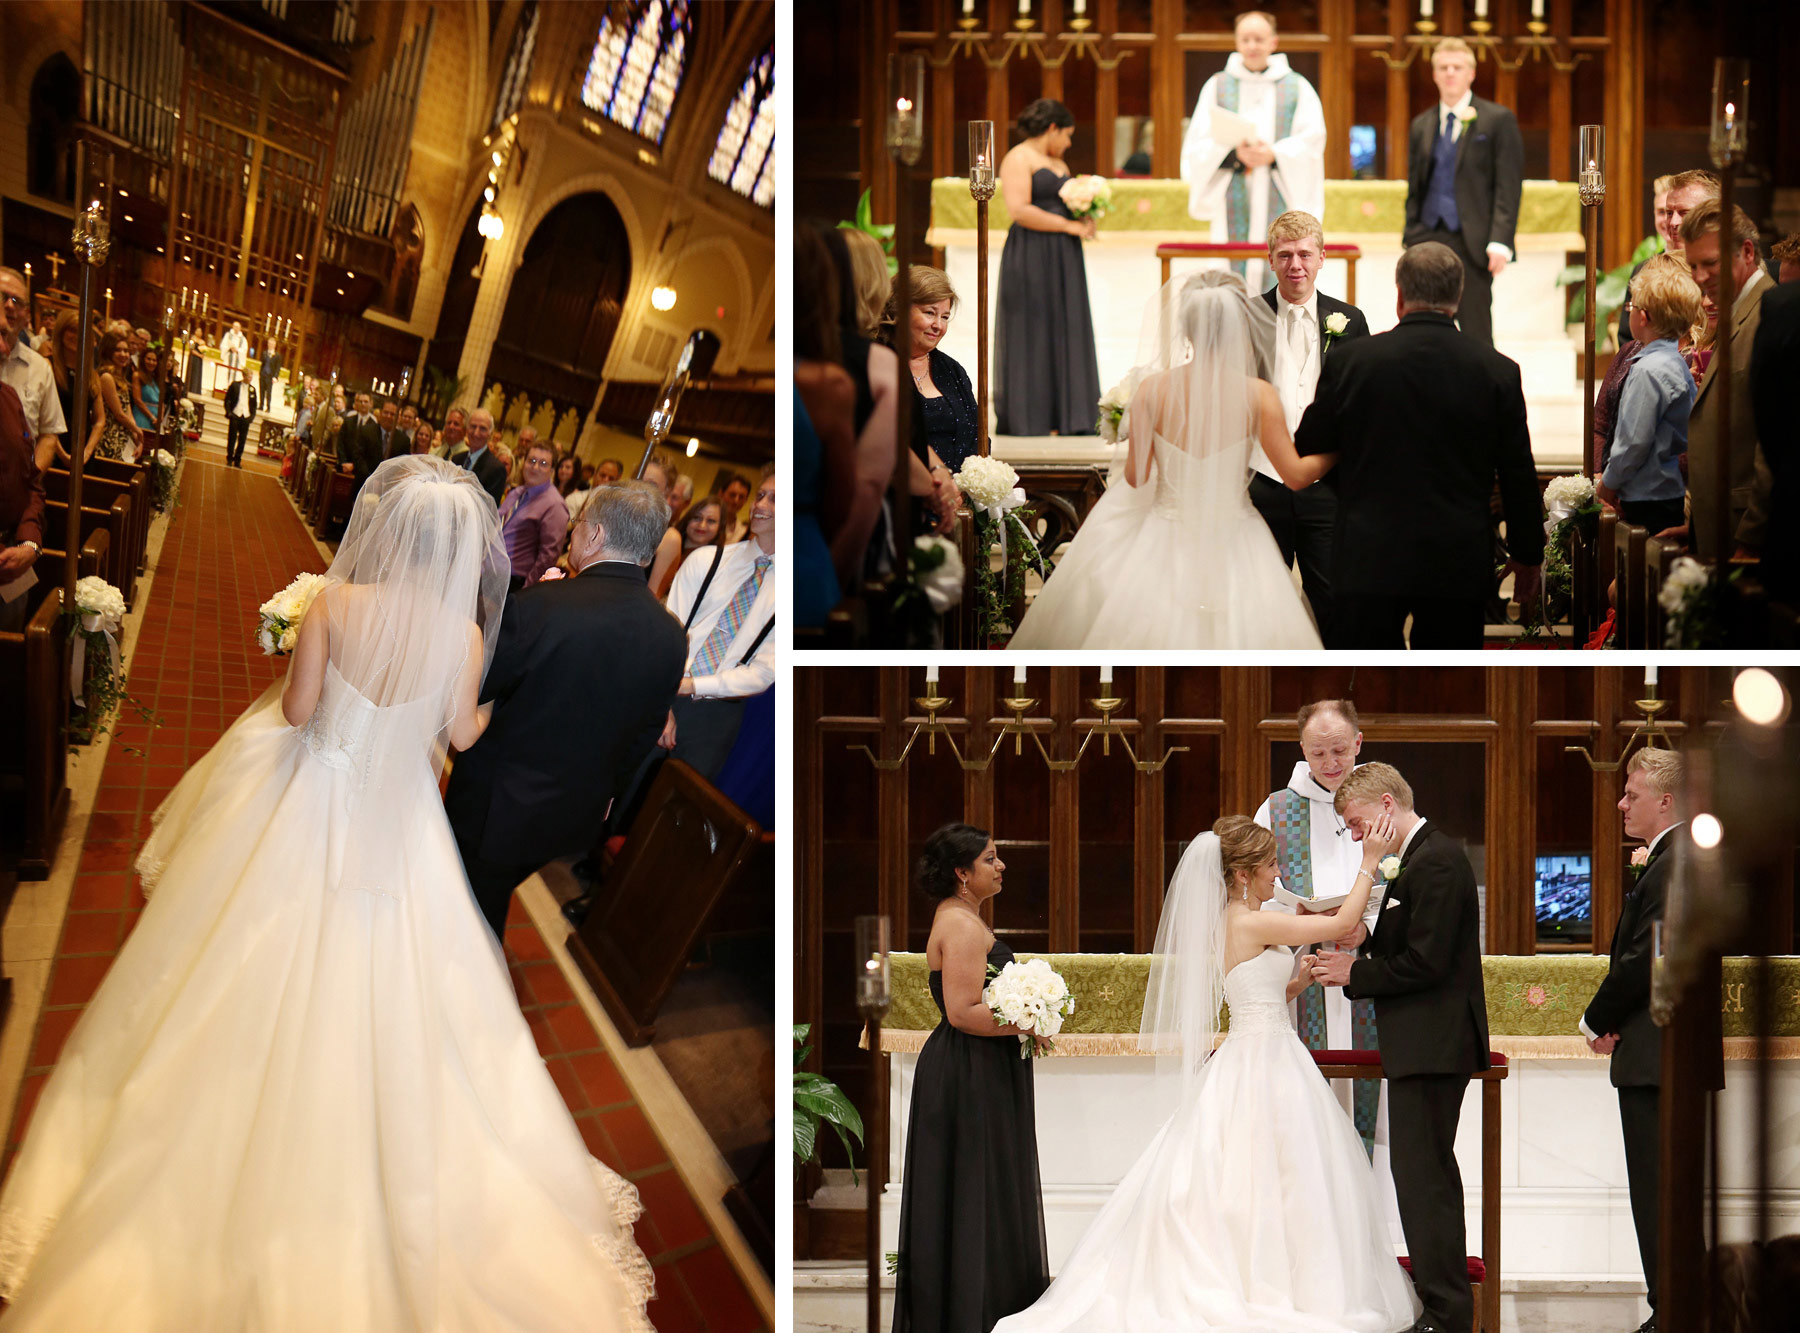 04-Minneapolis-Minnesota-Wedding-Photography-by-Vick-Photography-Central-Lutheran-Church-Ceremony-Courtney-&-John.jpg